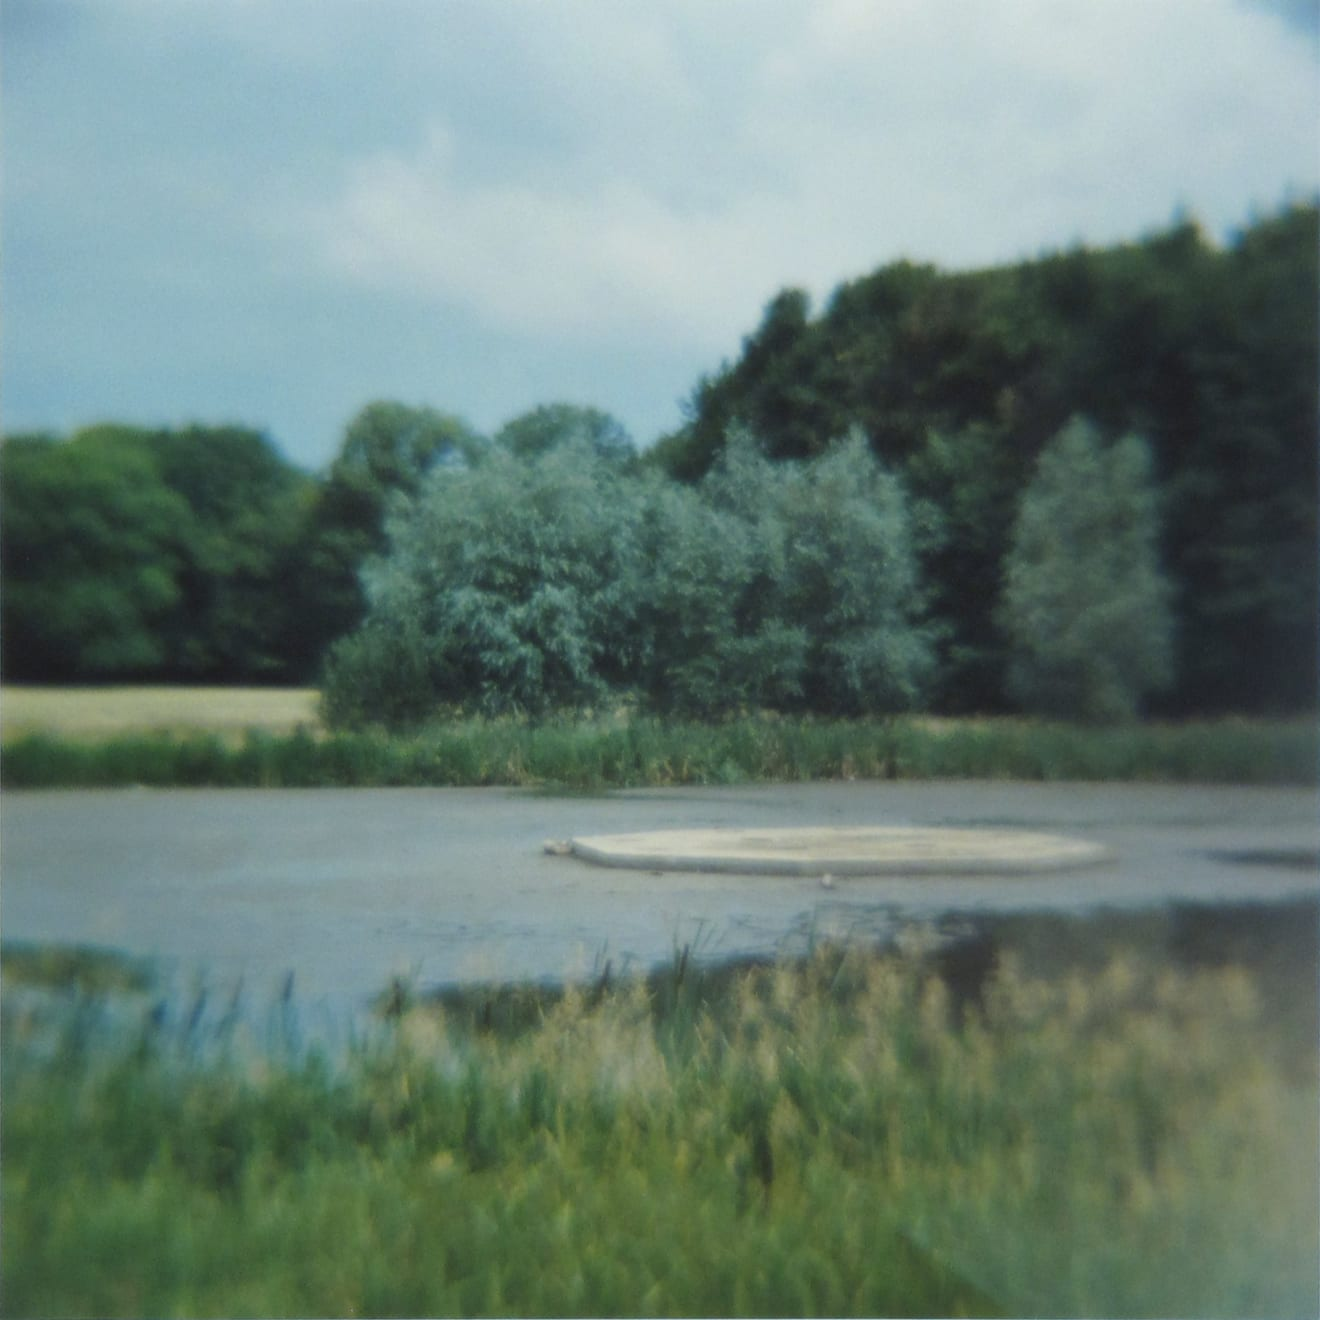 Amy Blakemore Park Pond, 2018 chromogenic print 15 x 15 in (38.1 x 38.1 cm) ABL 258 $3,000